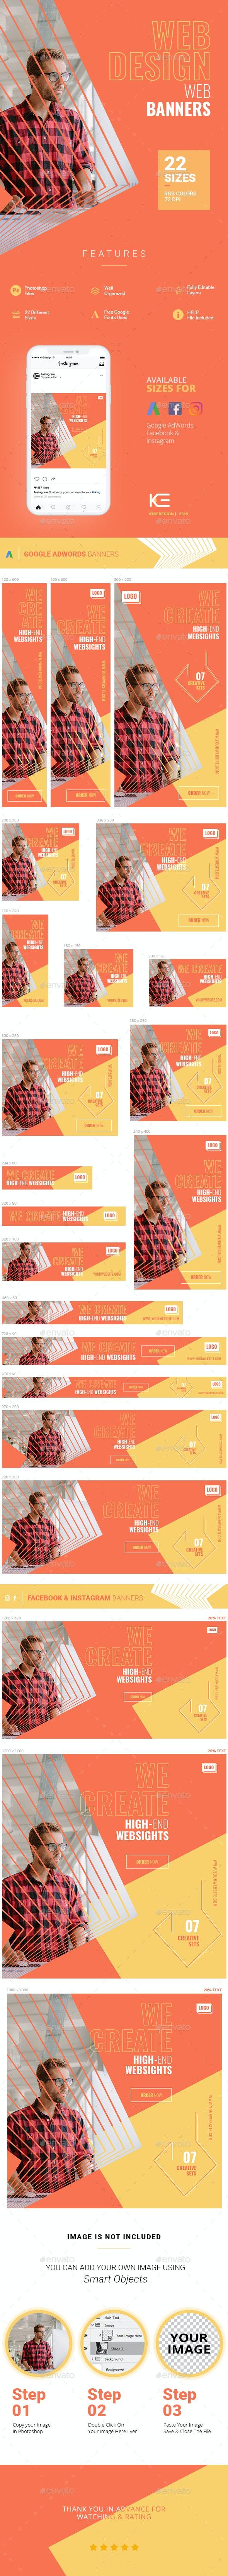 Web Design Web Banners - Banners & Ads Web Elements